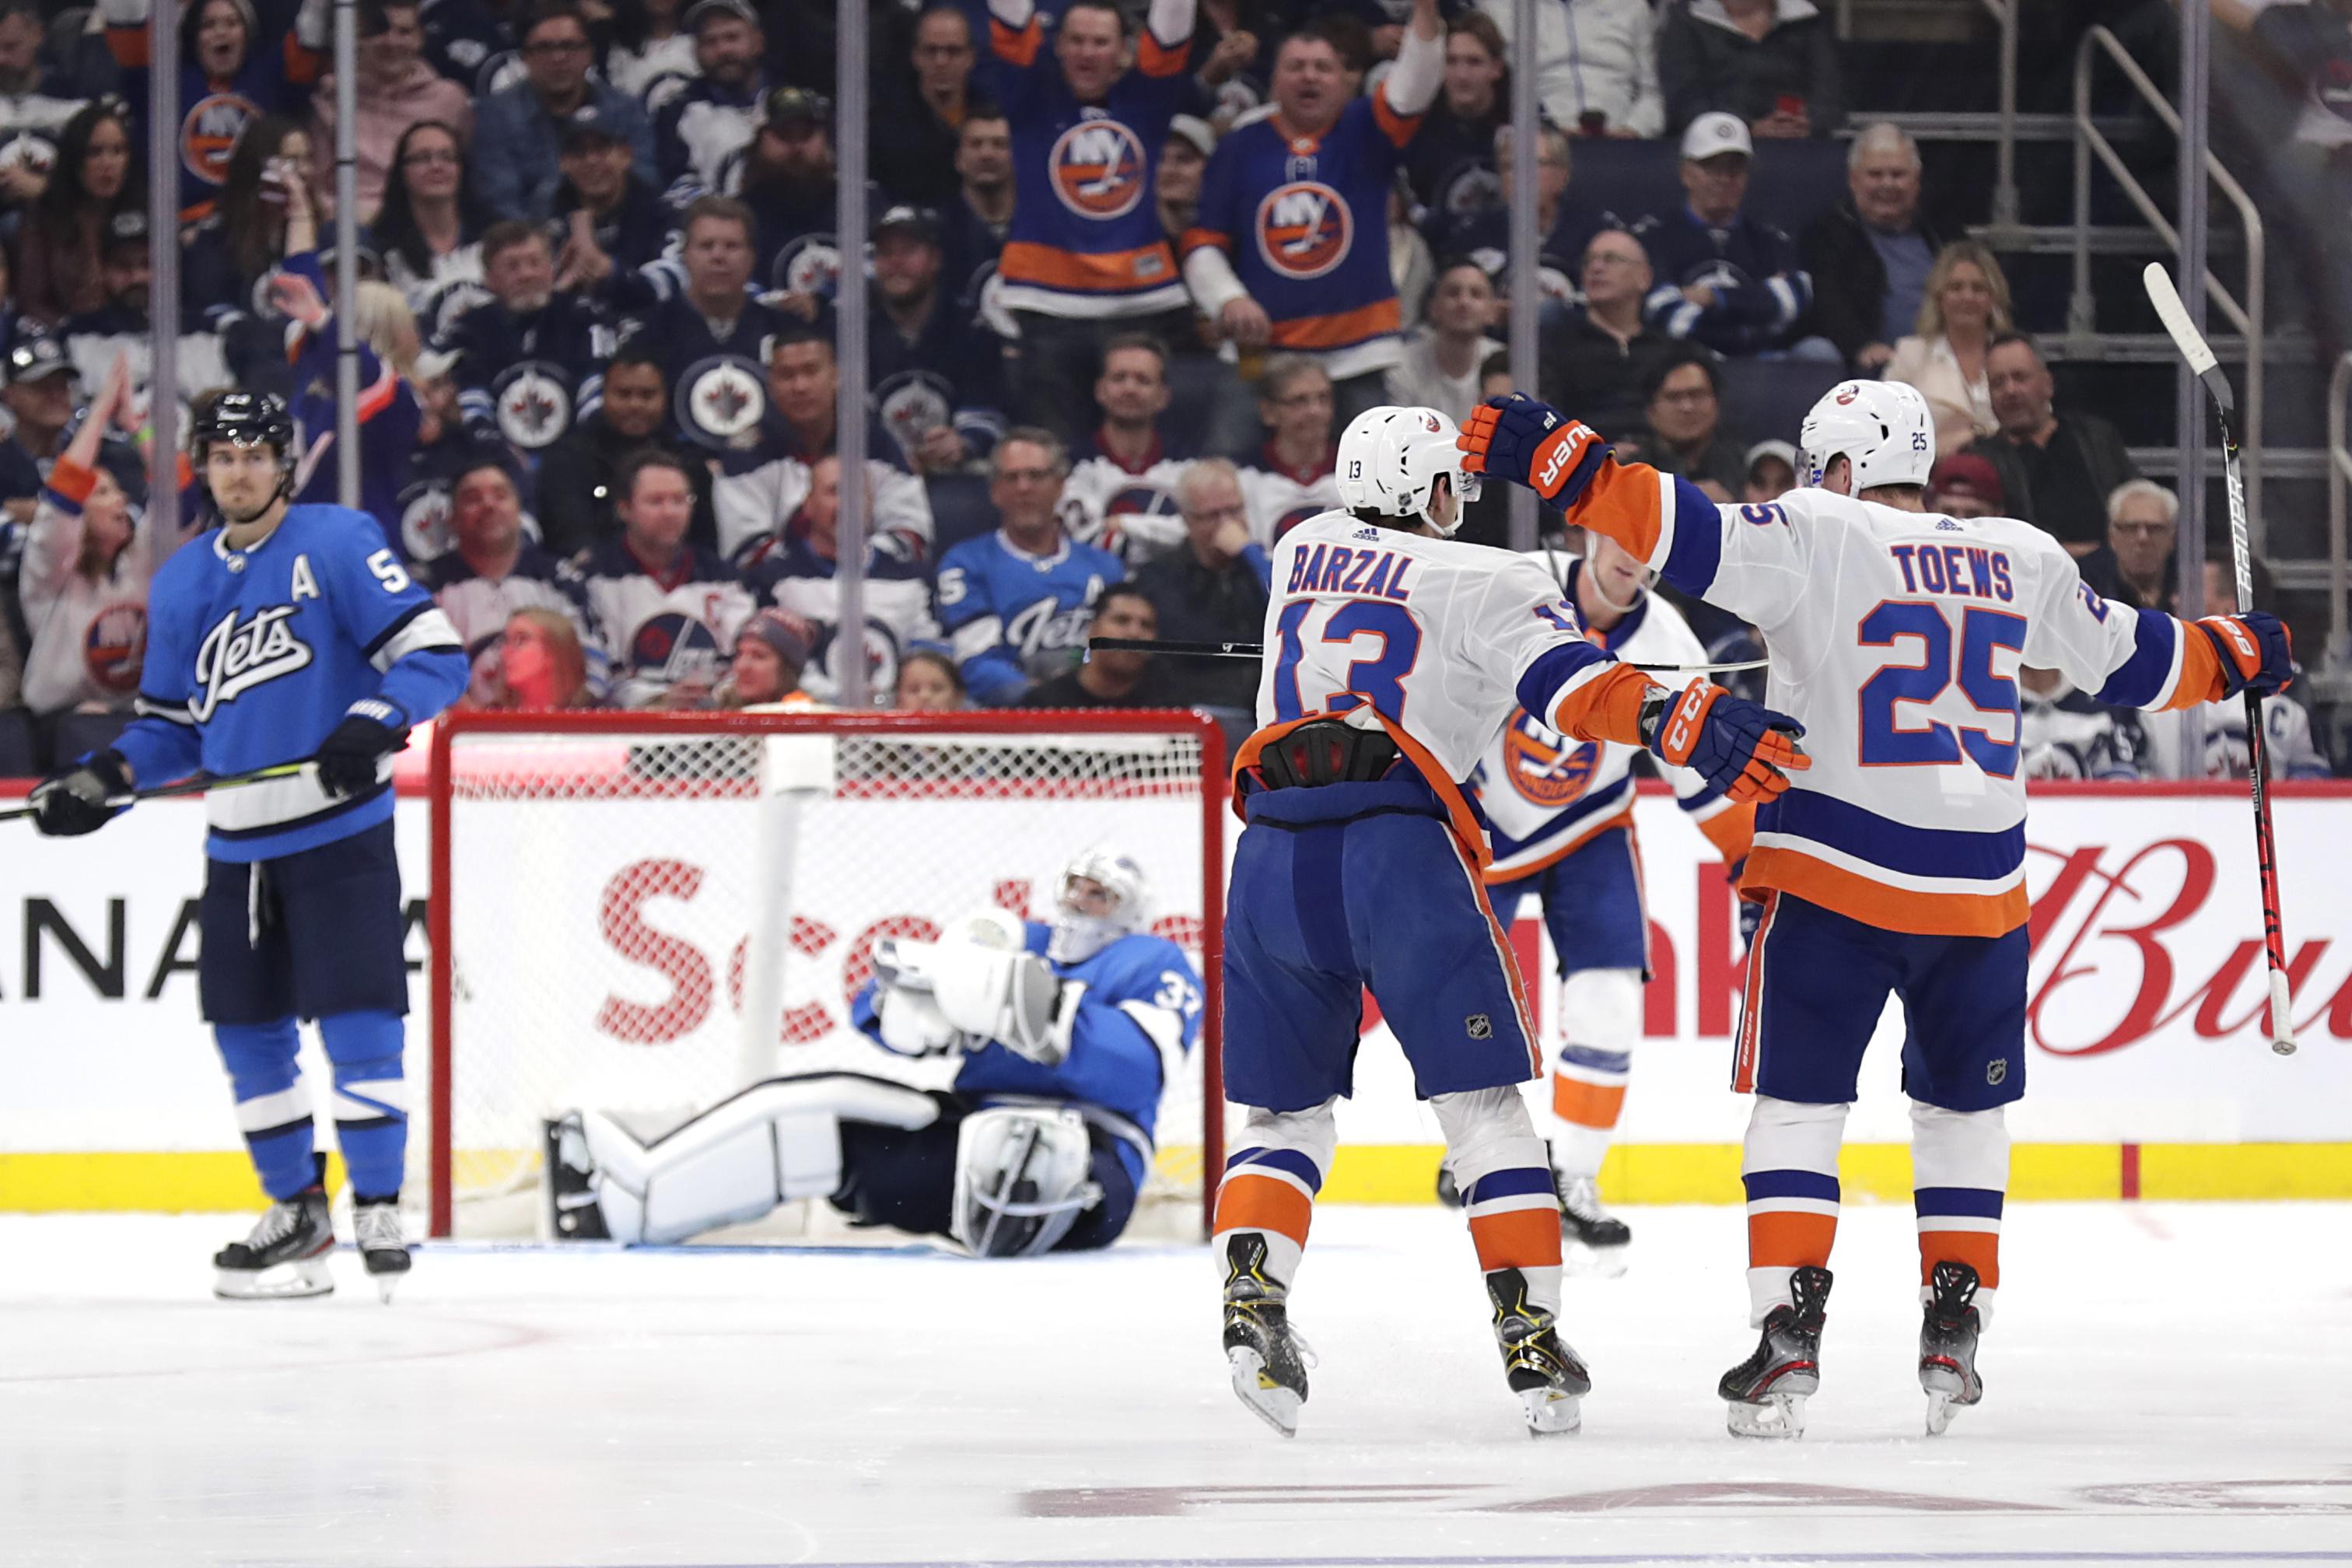 Oct 17, 2019; Winnipeg, Manitoba, CAN; New York Islanders center Mathew Barzal (13) celebrates his second period goal against the Winnipeg Jets at Bell MTS Place. Mandatory Credit: James Carey Lauder-USA TODAY Sports